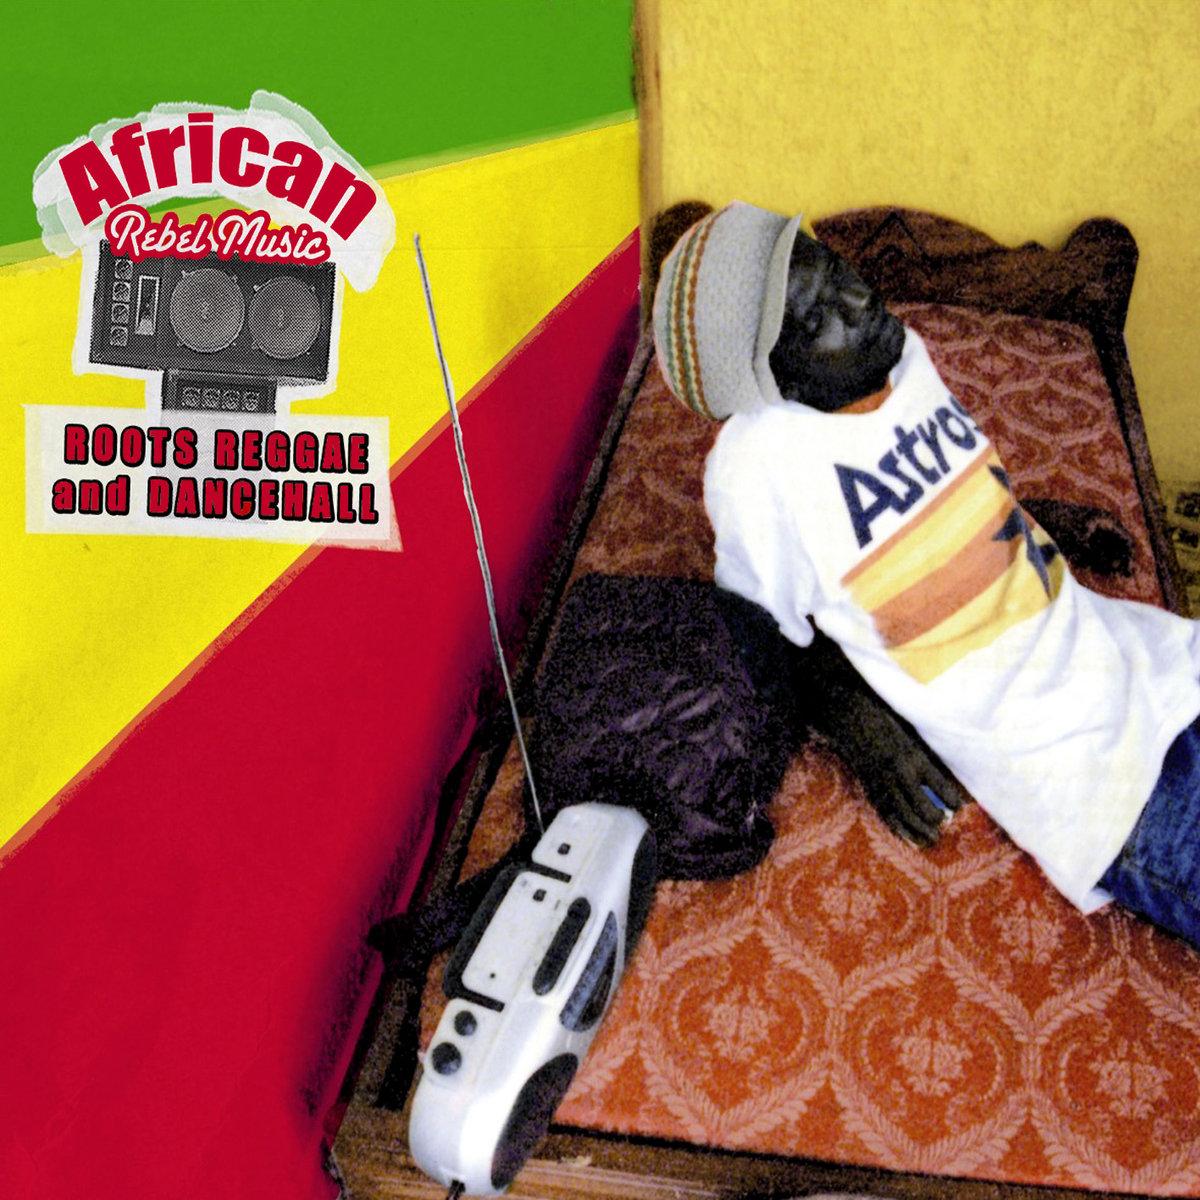 African Rebel Music